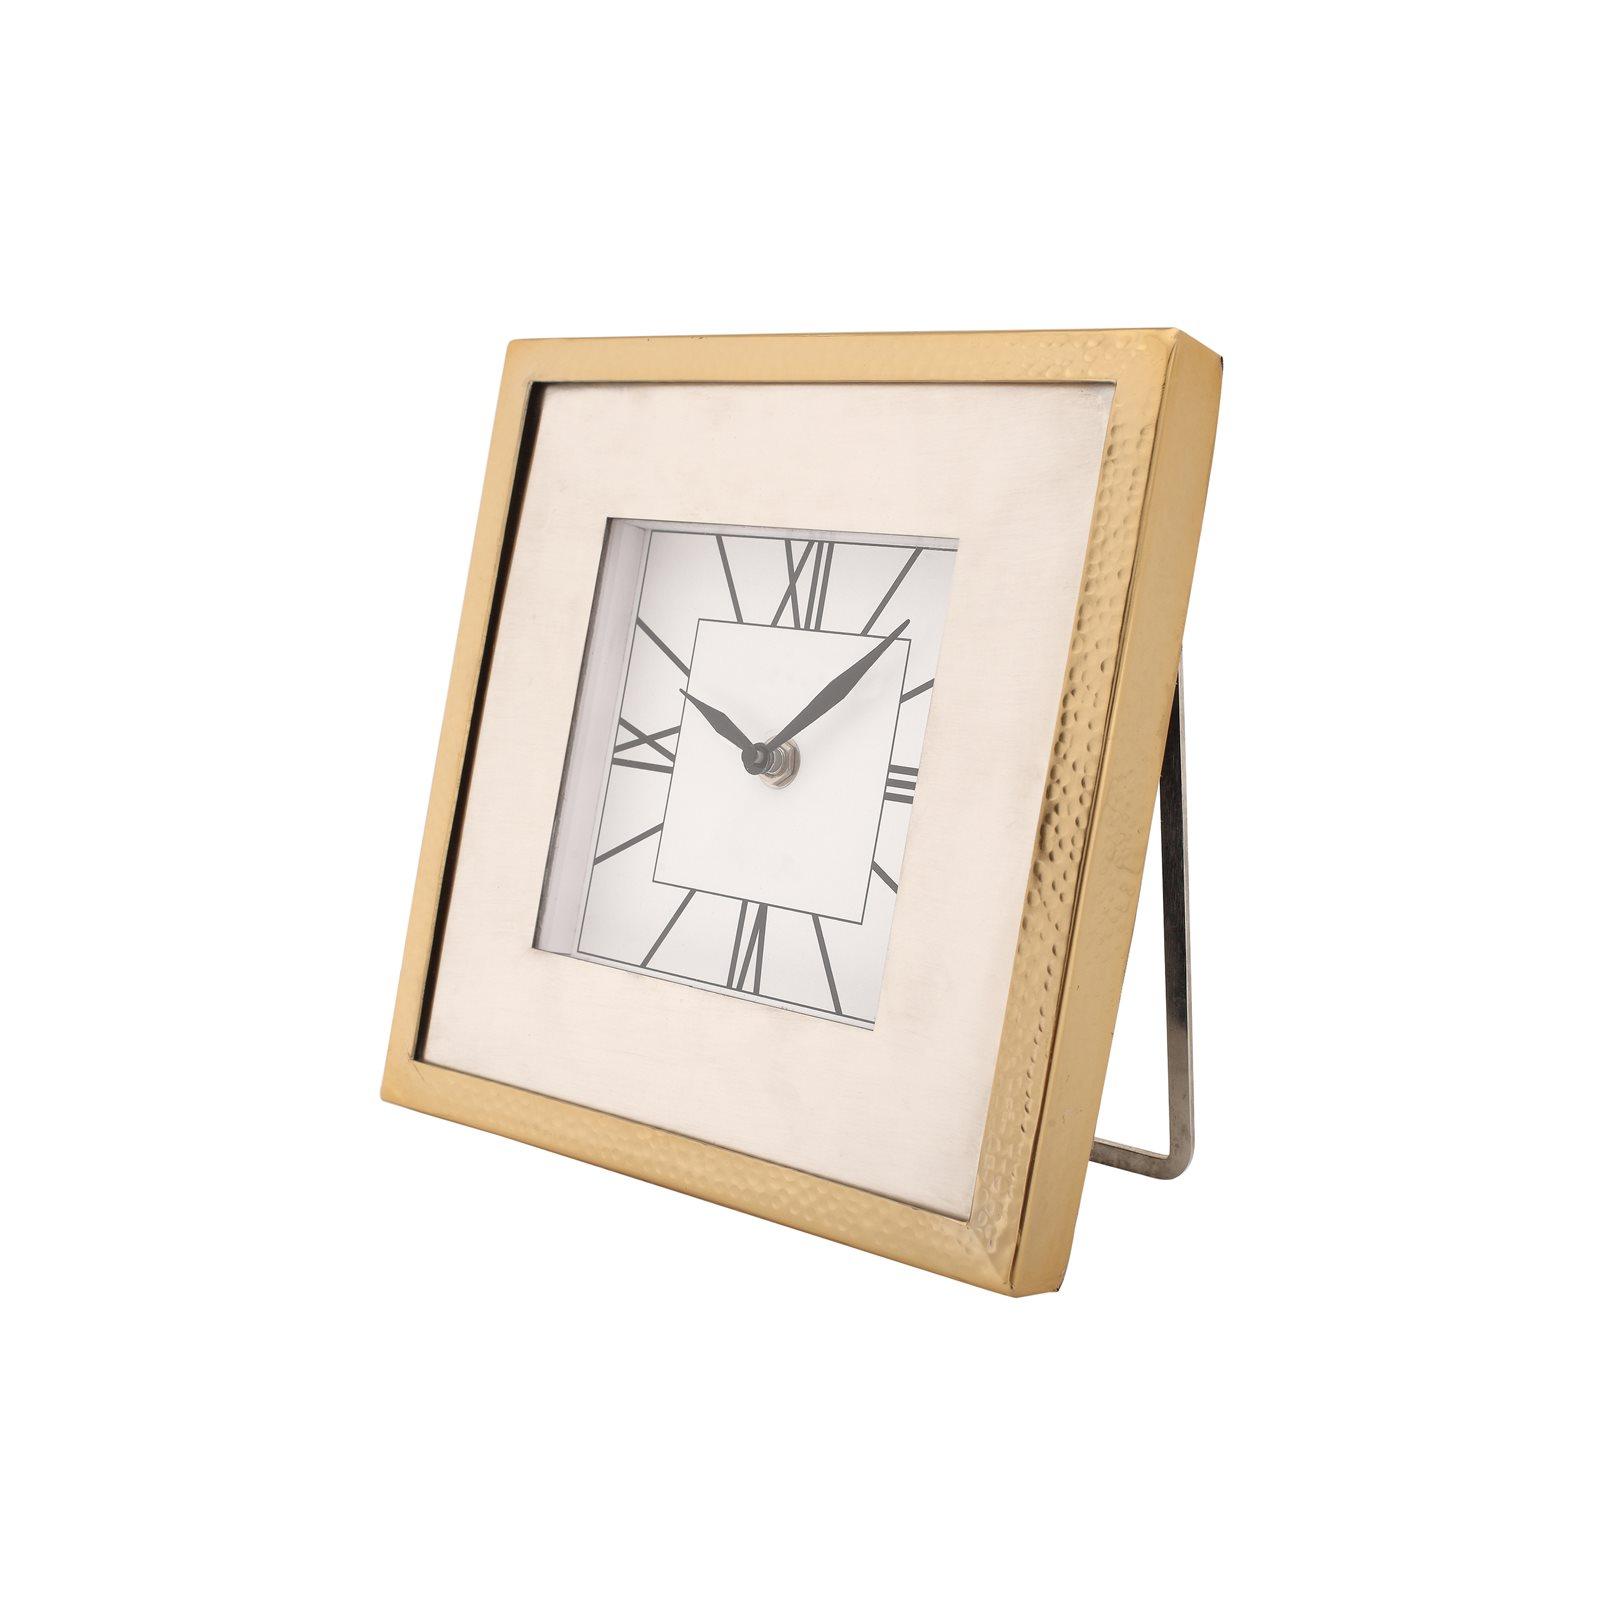 Horloge de table Or 3x22x22